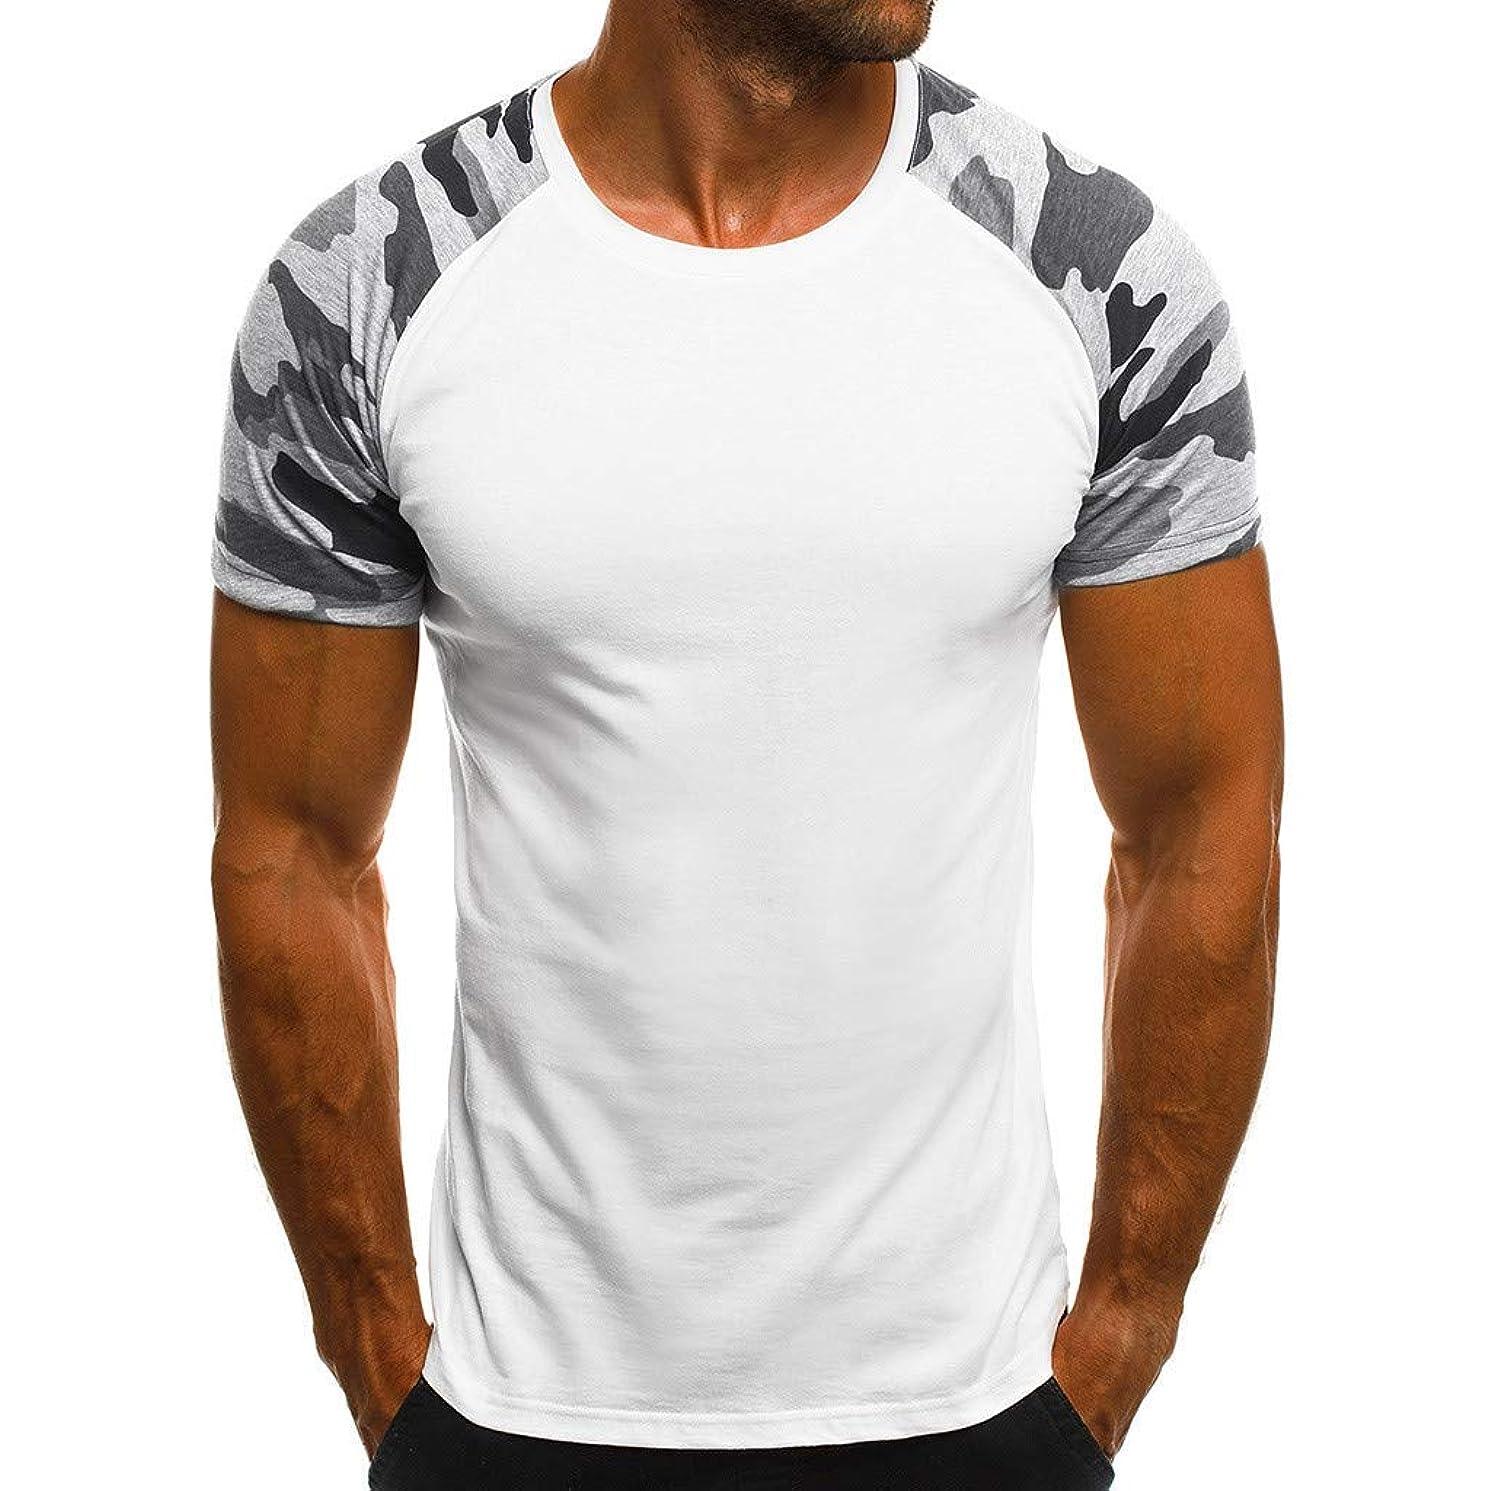 Benficial Men's Casual Slim Printed Short Sleeve T Shirt Top Blouse Vest Tee